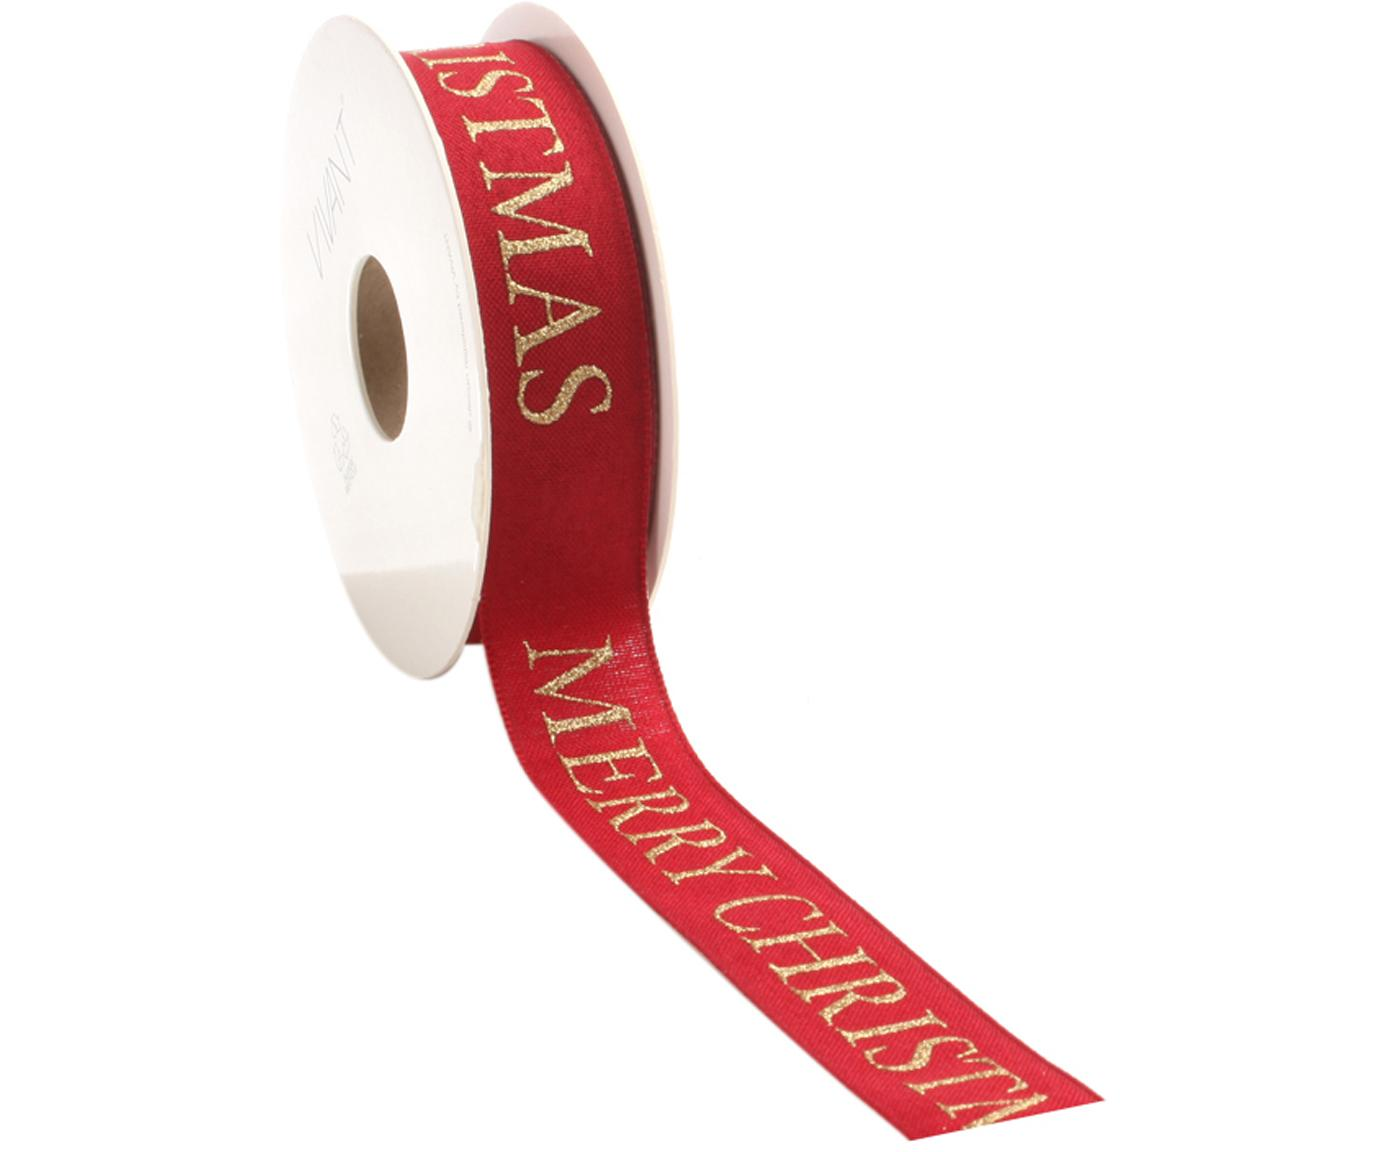 Geschenkband Textire, Polyester, Rot, Goldfarben, 3 x 1500 cm